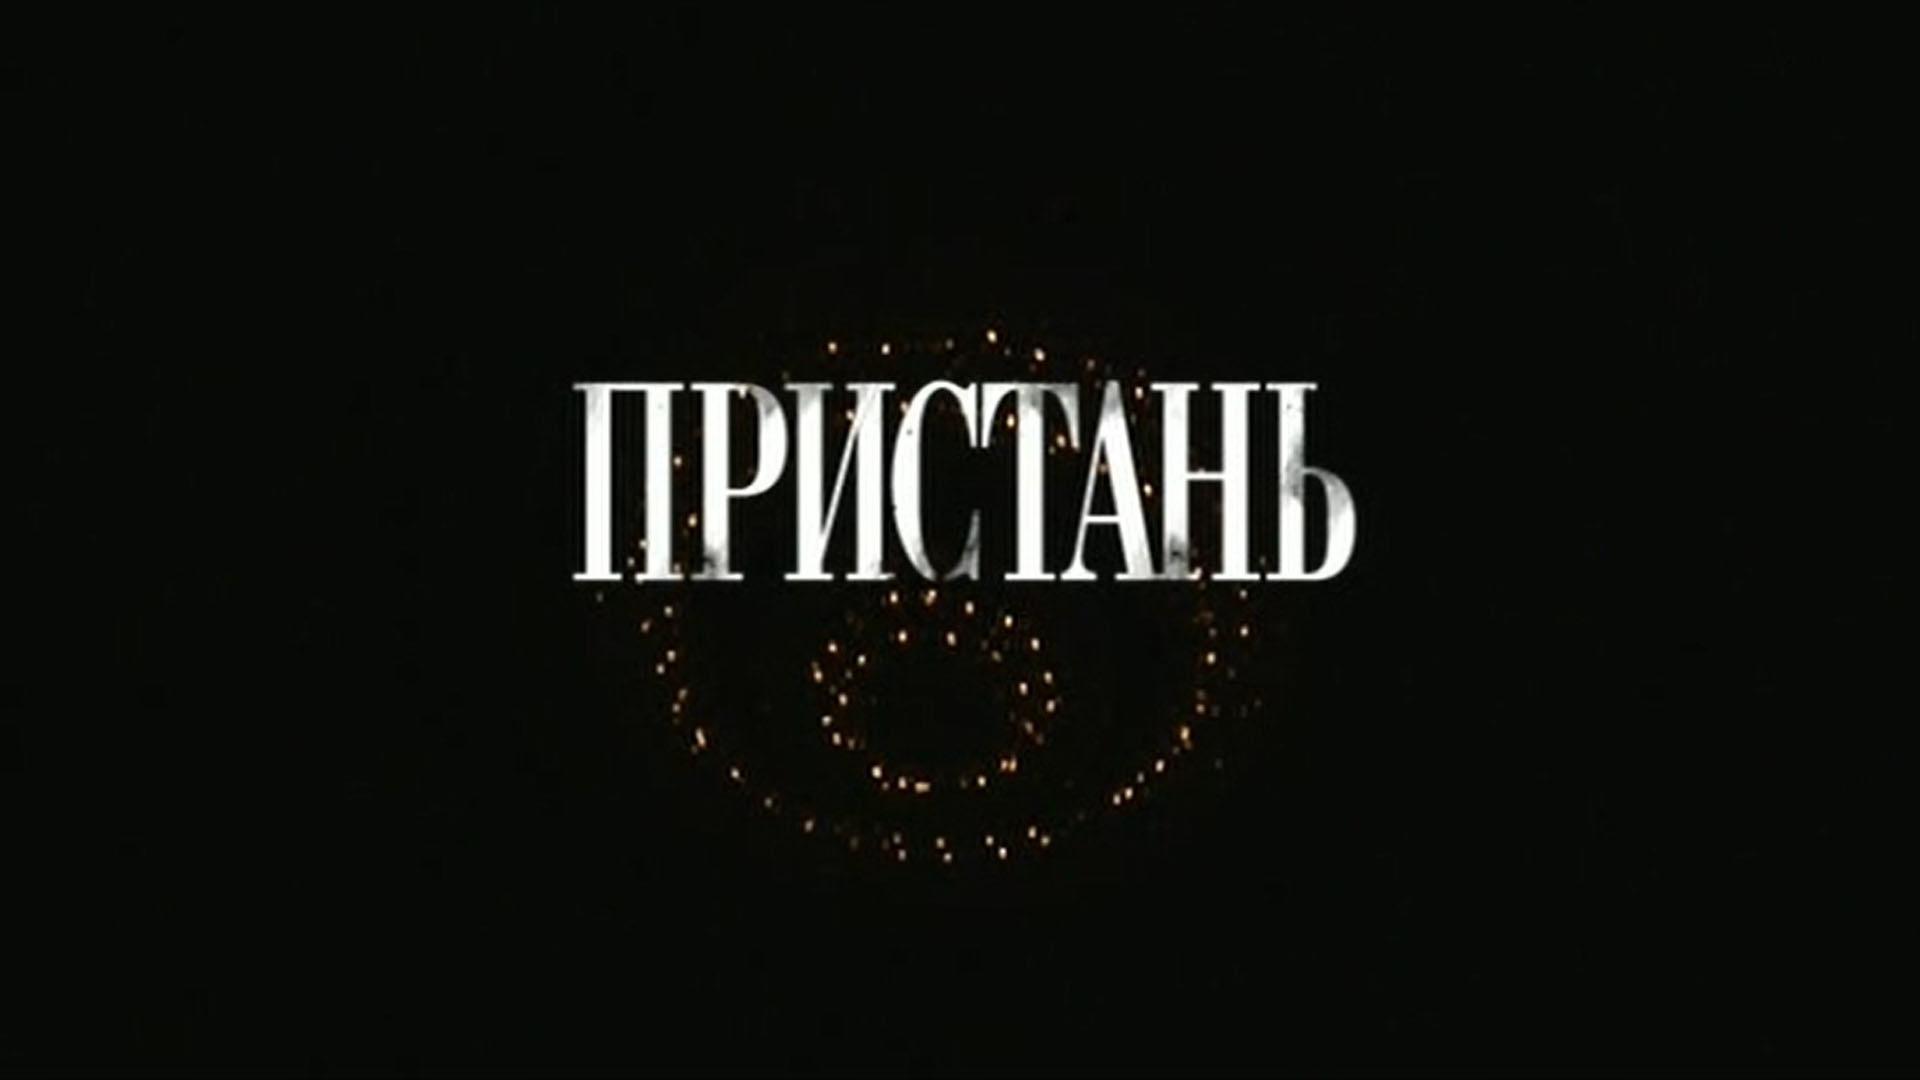 Пристань (спектакль Театра им. Евг. Вахтангова)